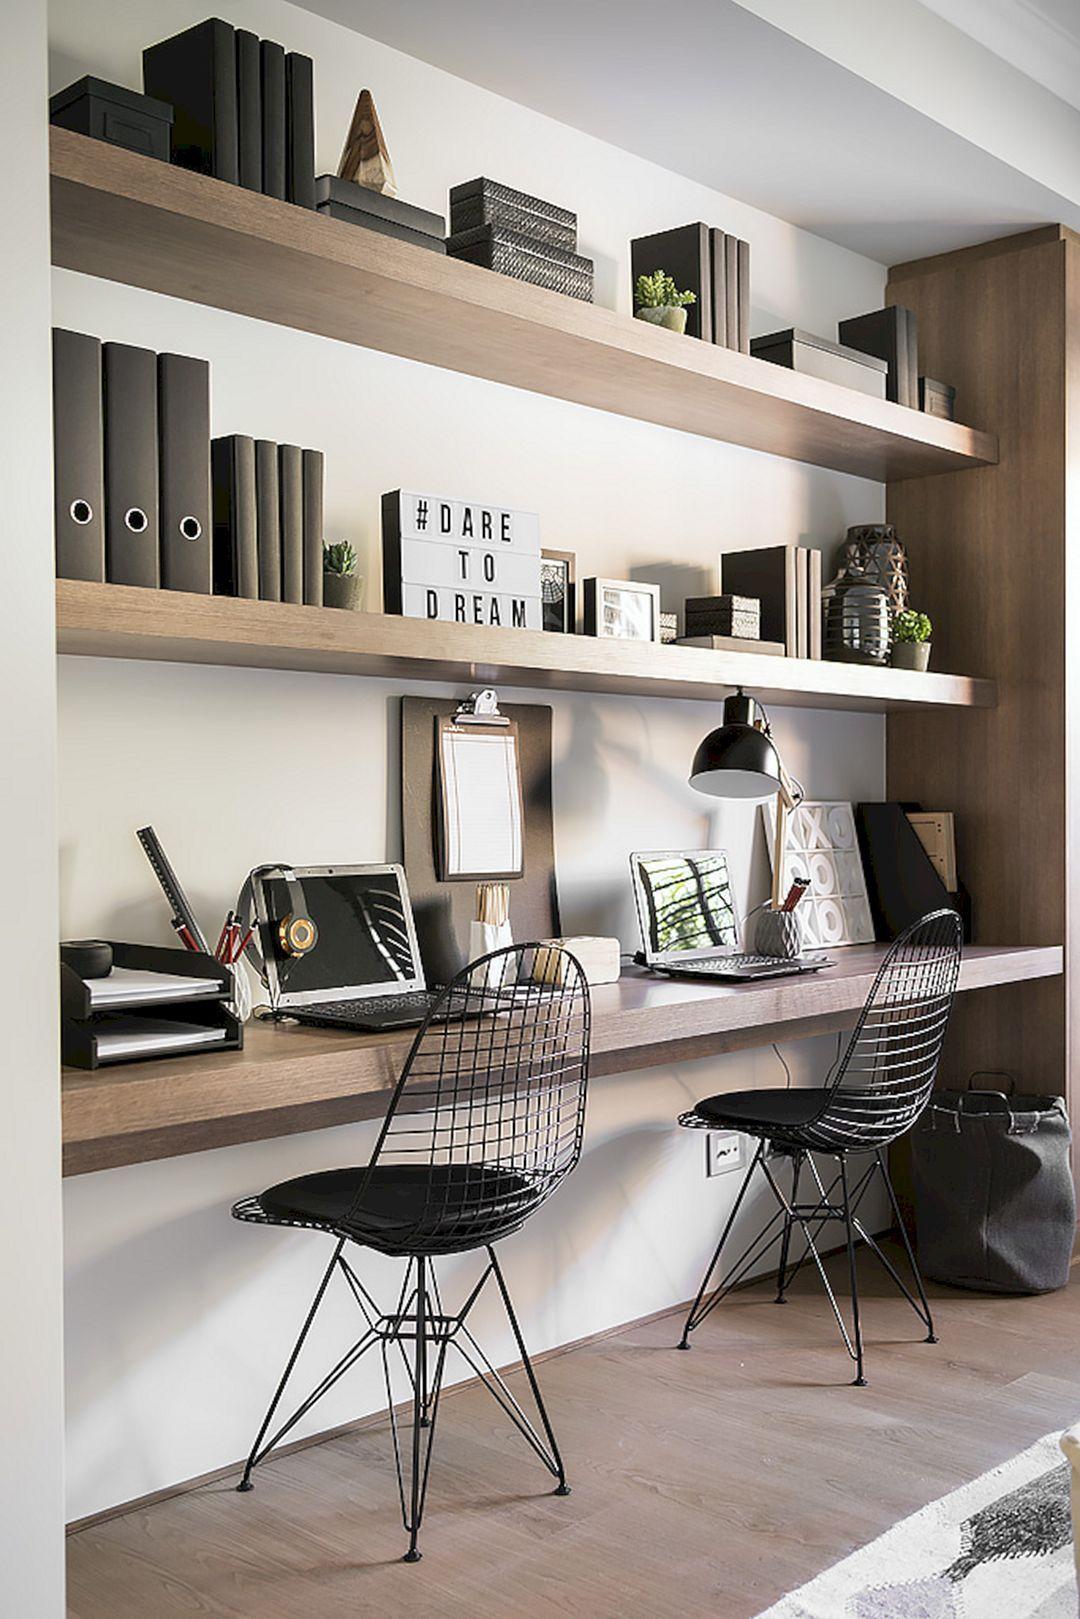 Home Office Study Design Ideas 1 Home Office Study Design Ideas 1